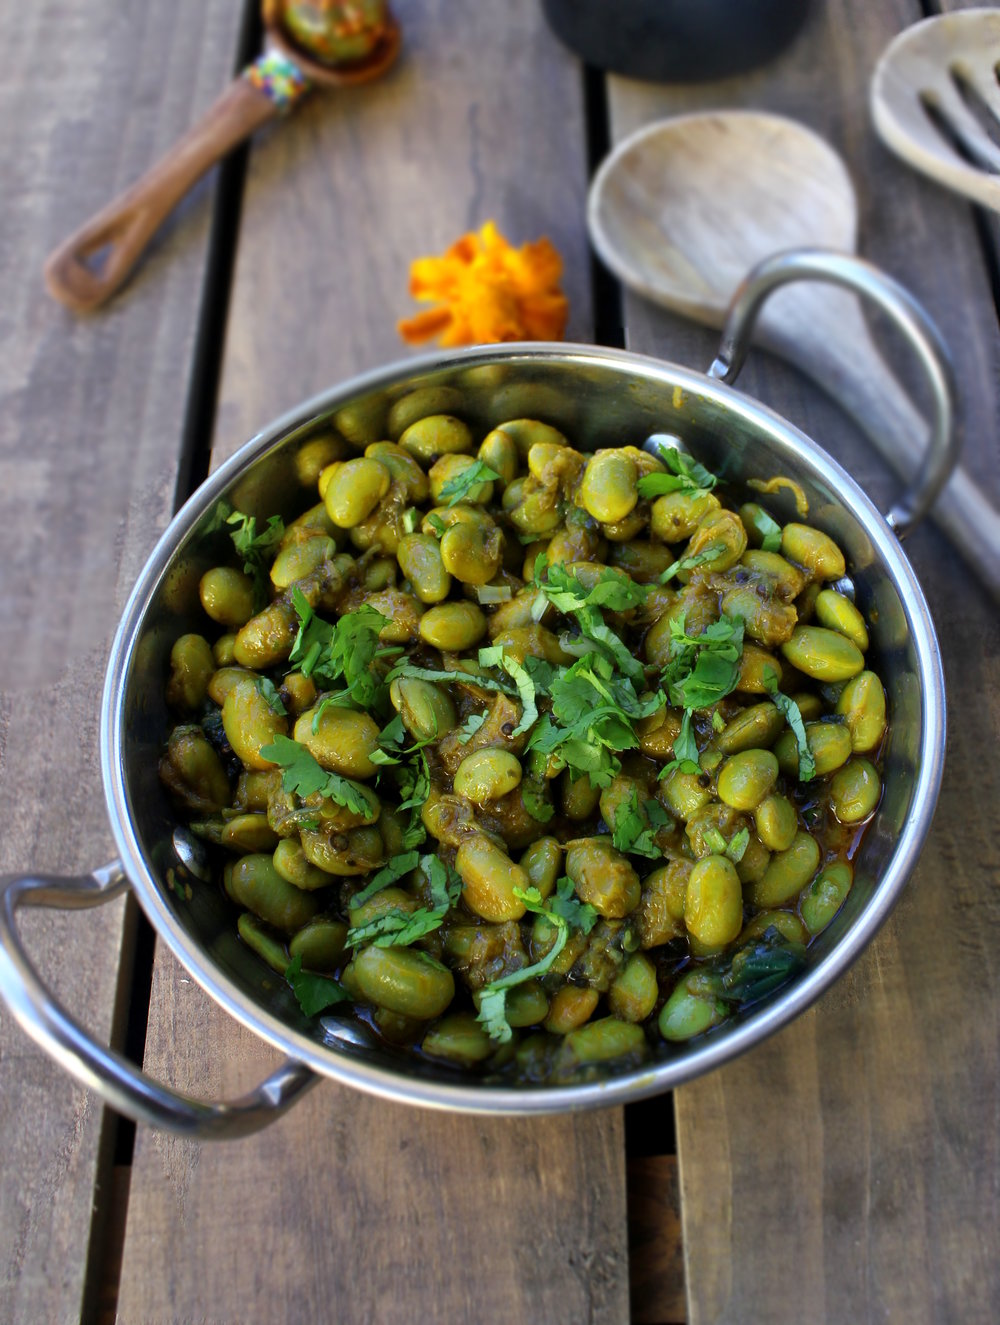 Shelled soybean/edamame nu shaak — Karishma Doolabh